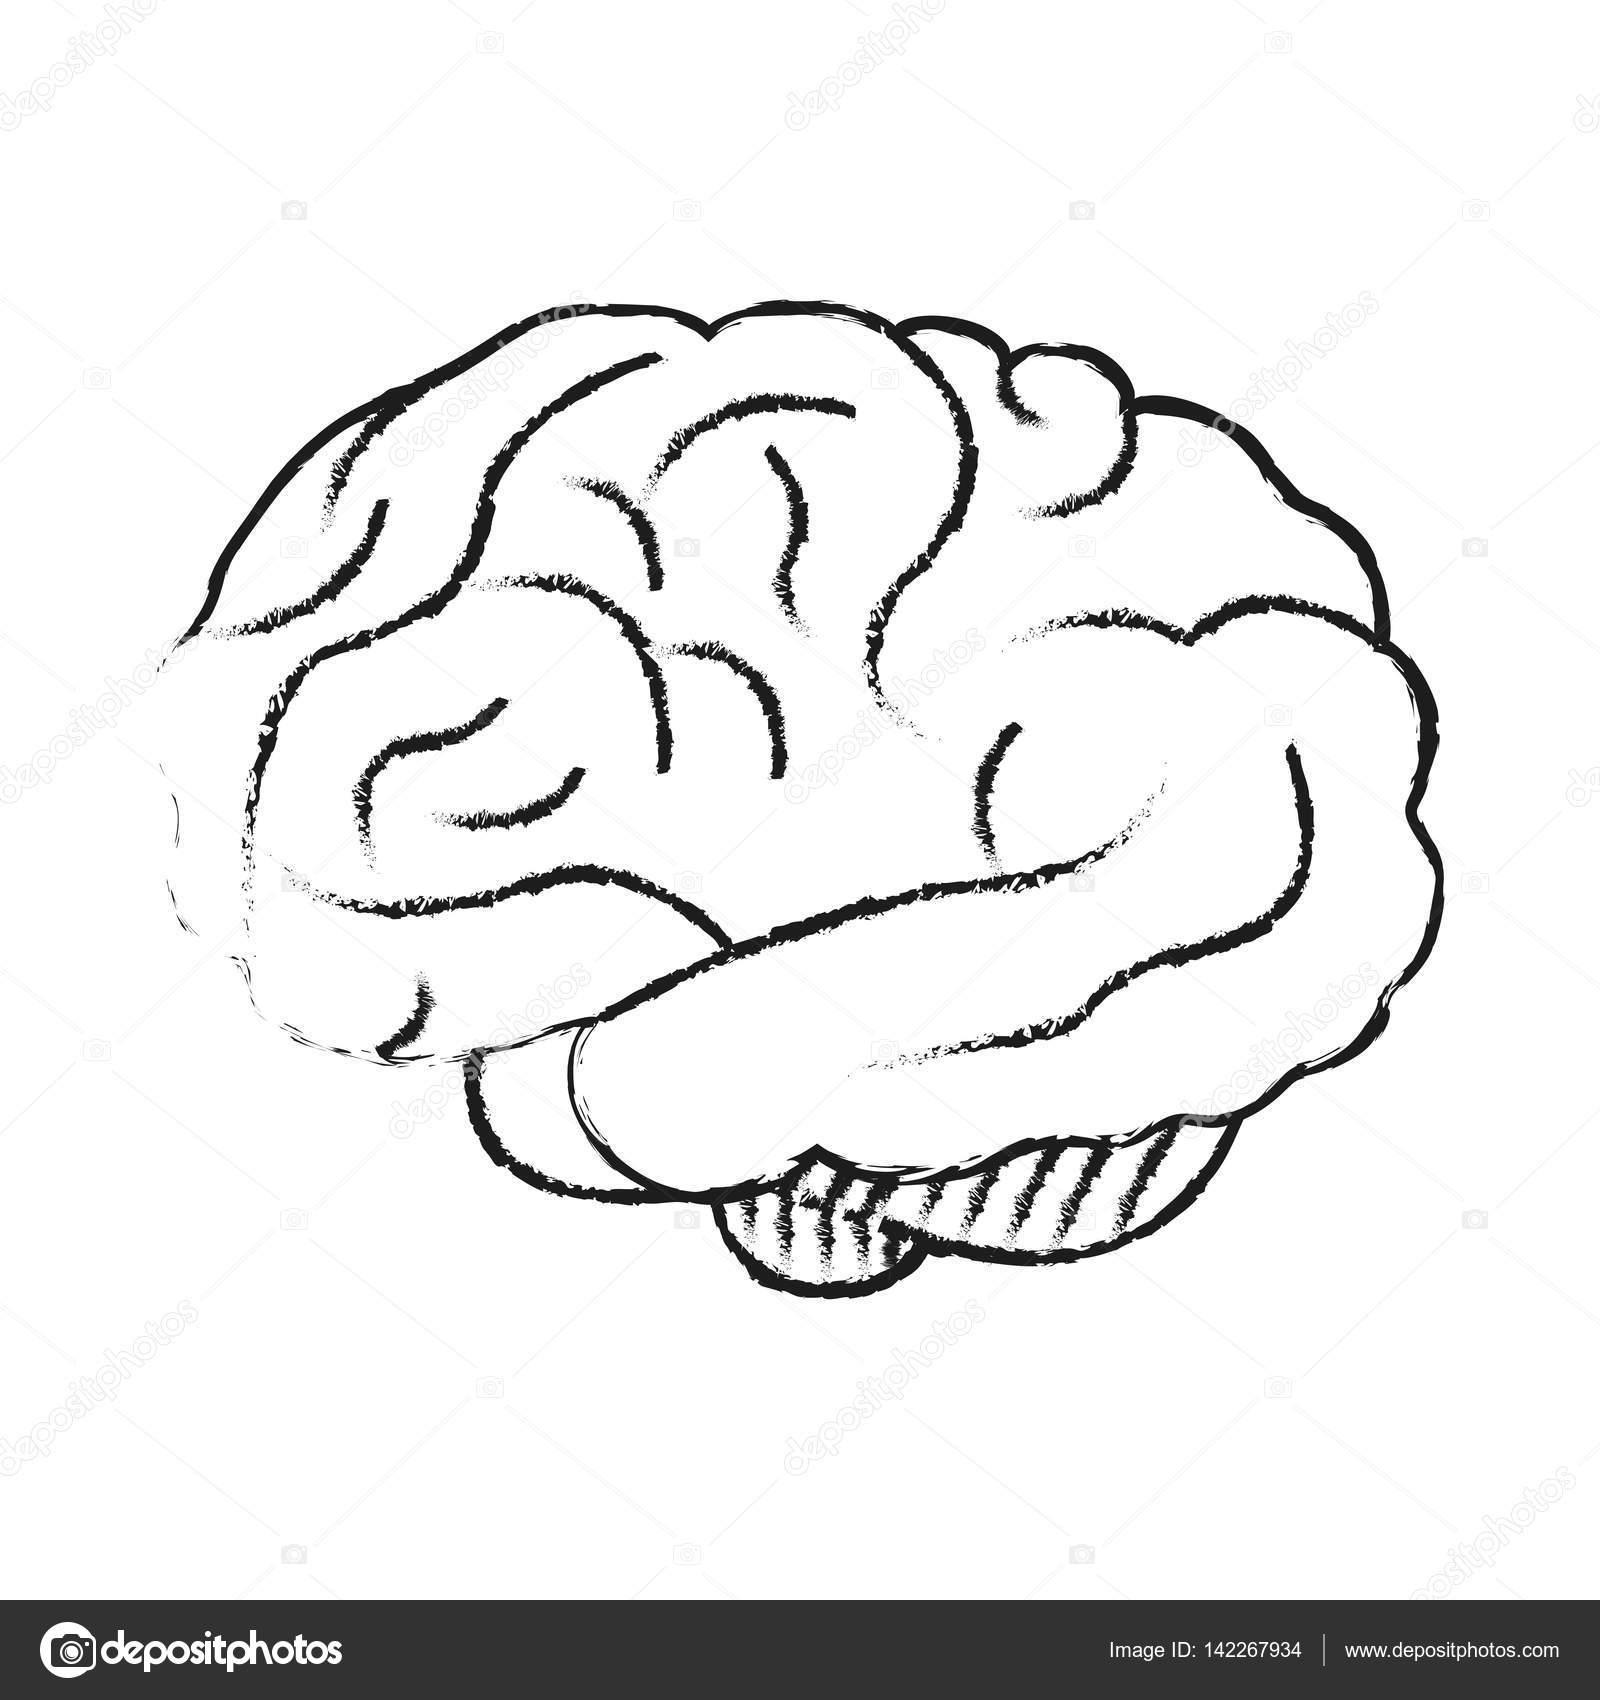 Icono del cerebro humano — Vector de stock © jemastock #142267934